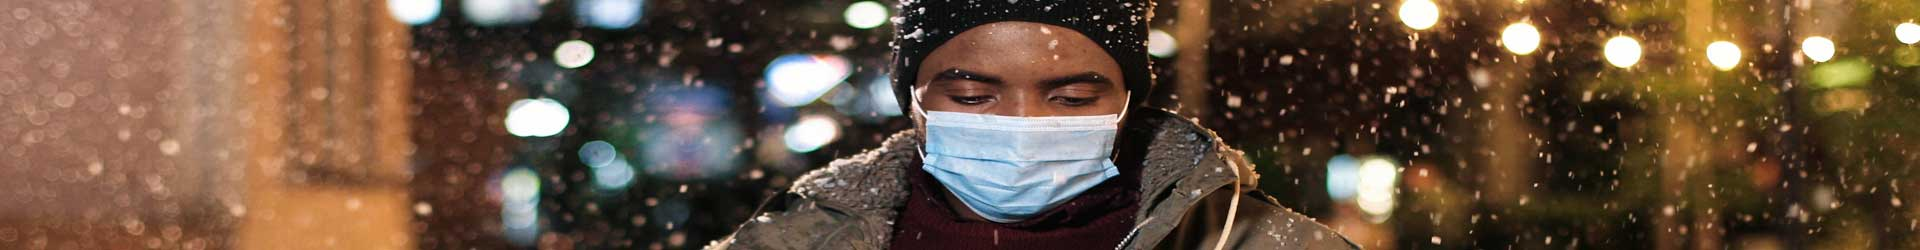 sad-man-outside-with-mask-on-during-quarantine-holiday-season